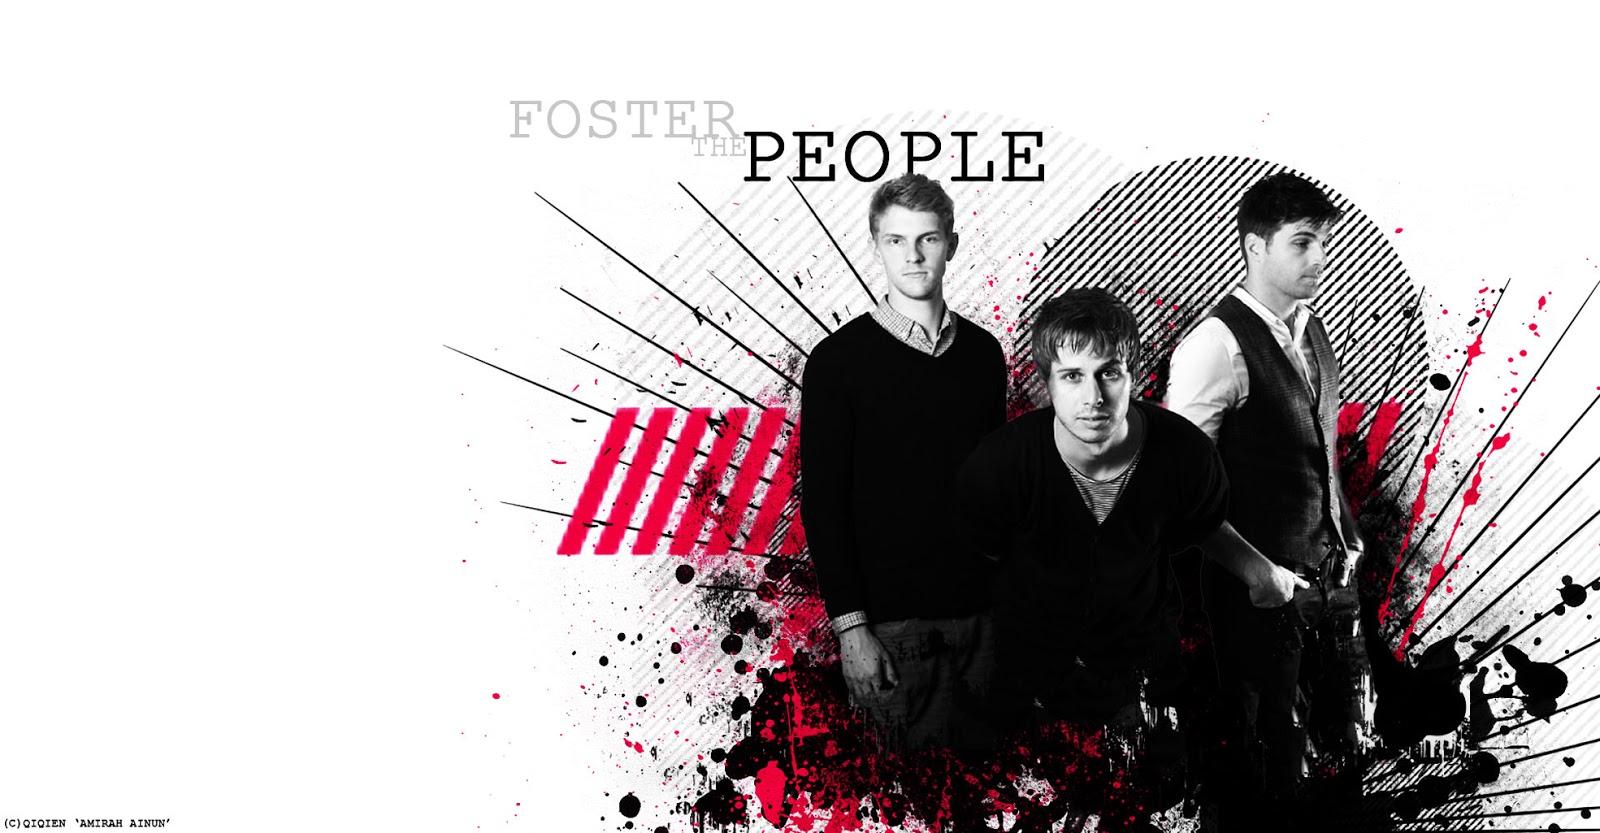 1600x833px Foster The People Wallpaper Wallpapersafari